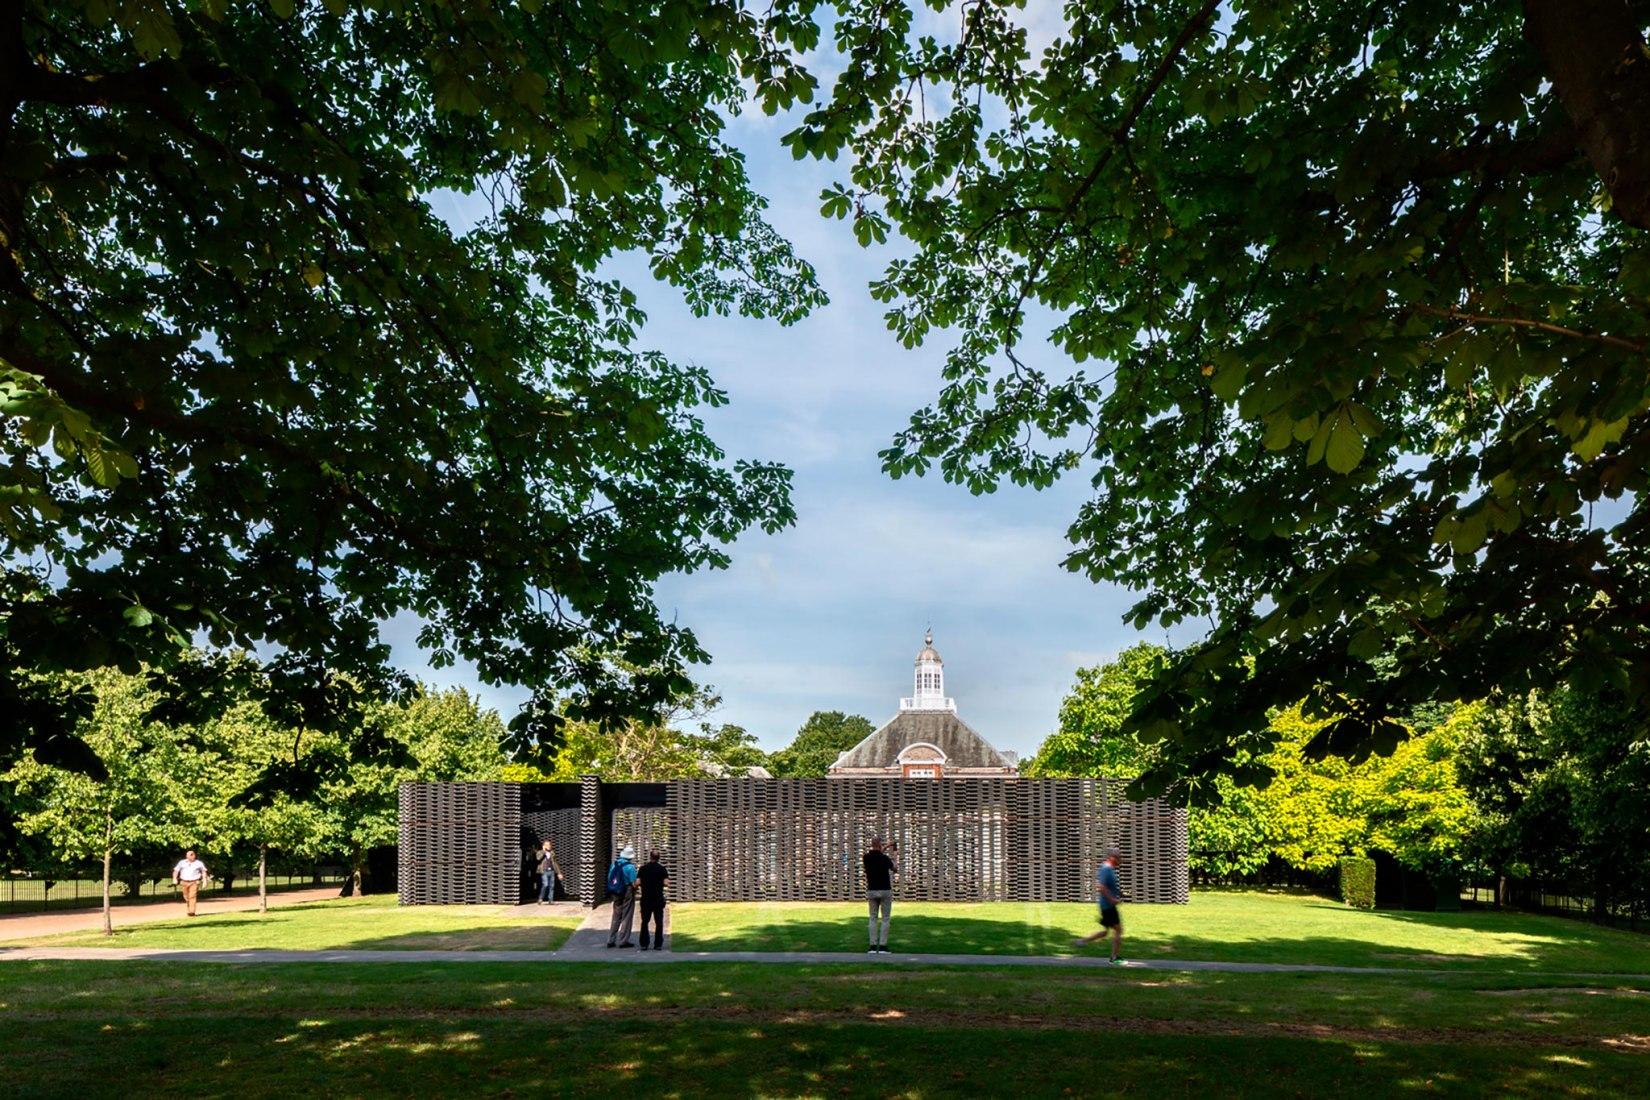 Serpentine Pavilion 2018, designed by Frida Escobedo, Serpentine Gallery, London (15 June – 7 October 2018) © Frida Escobedo, Taller de Arquitectura, Photography © 2018 Rafael Gamo